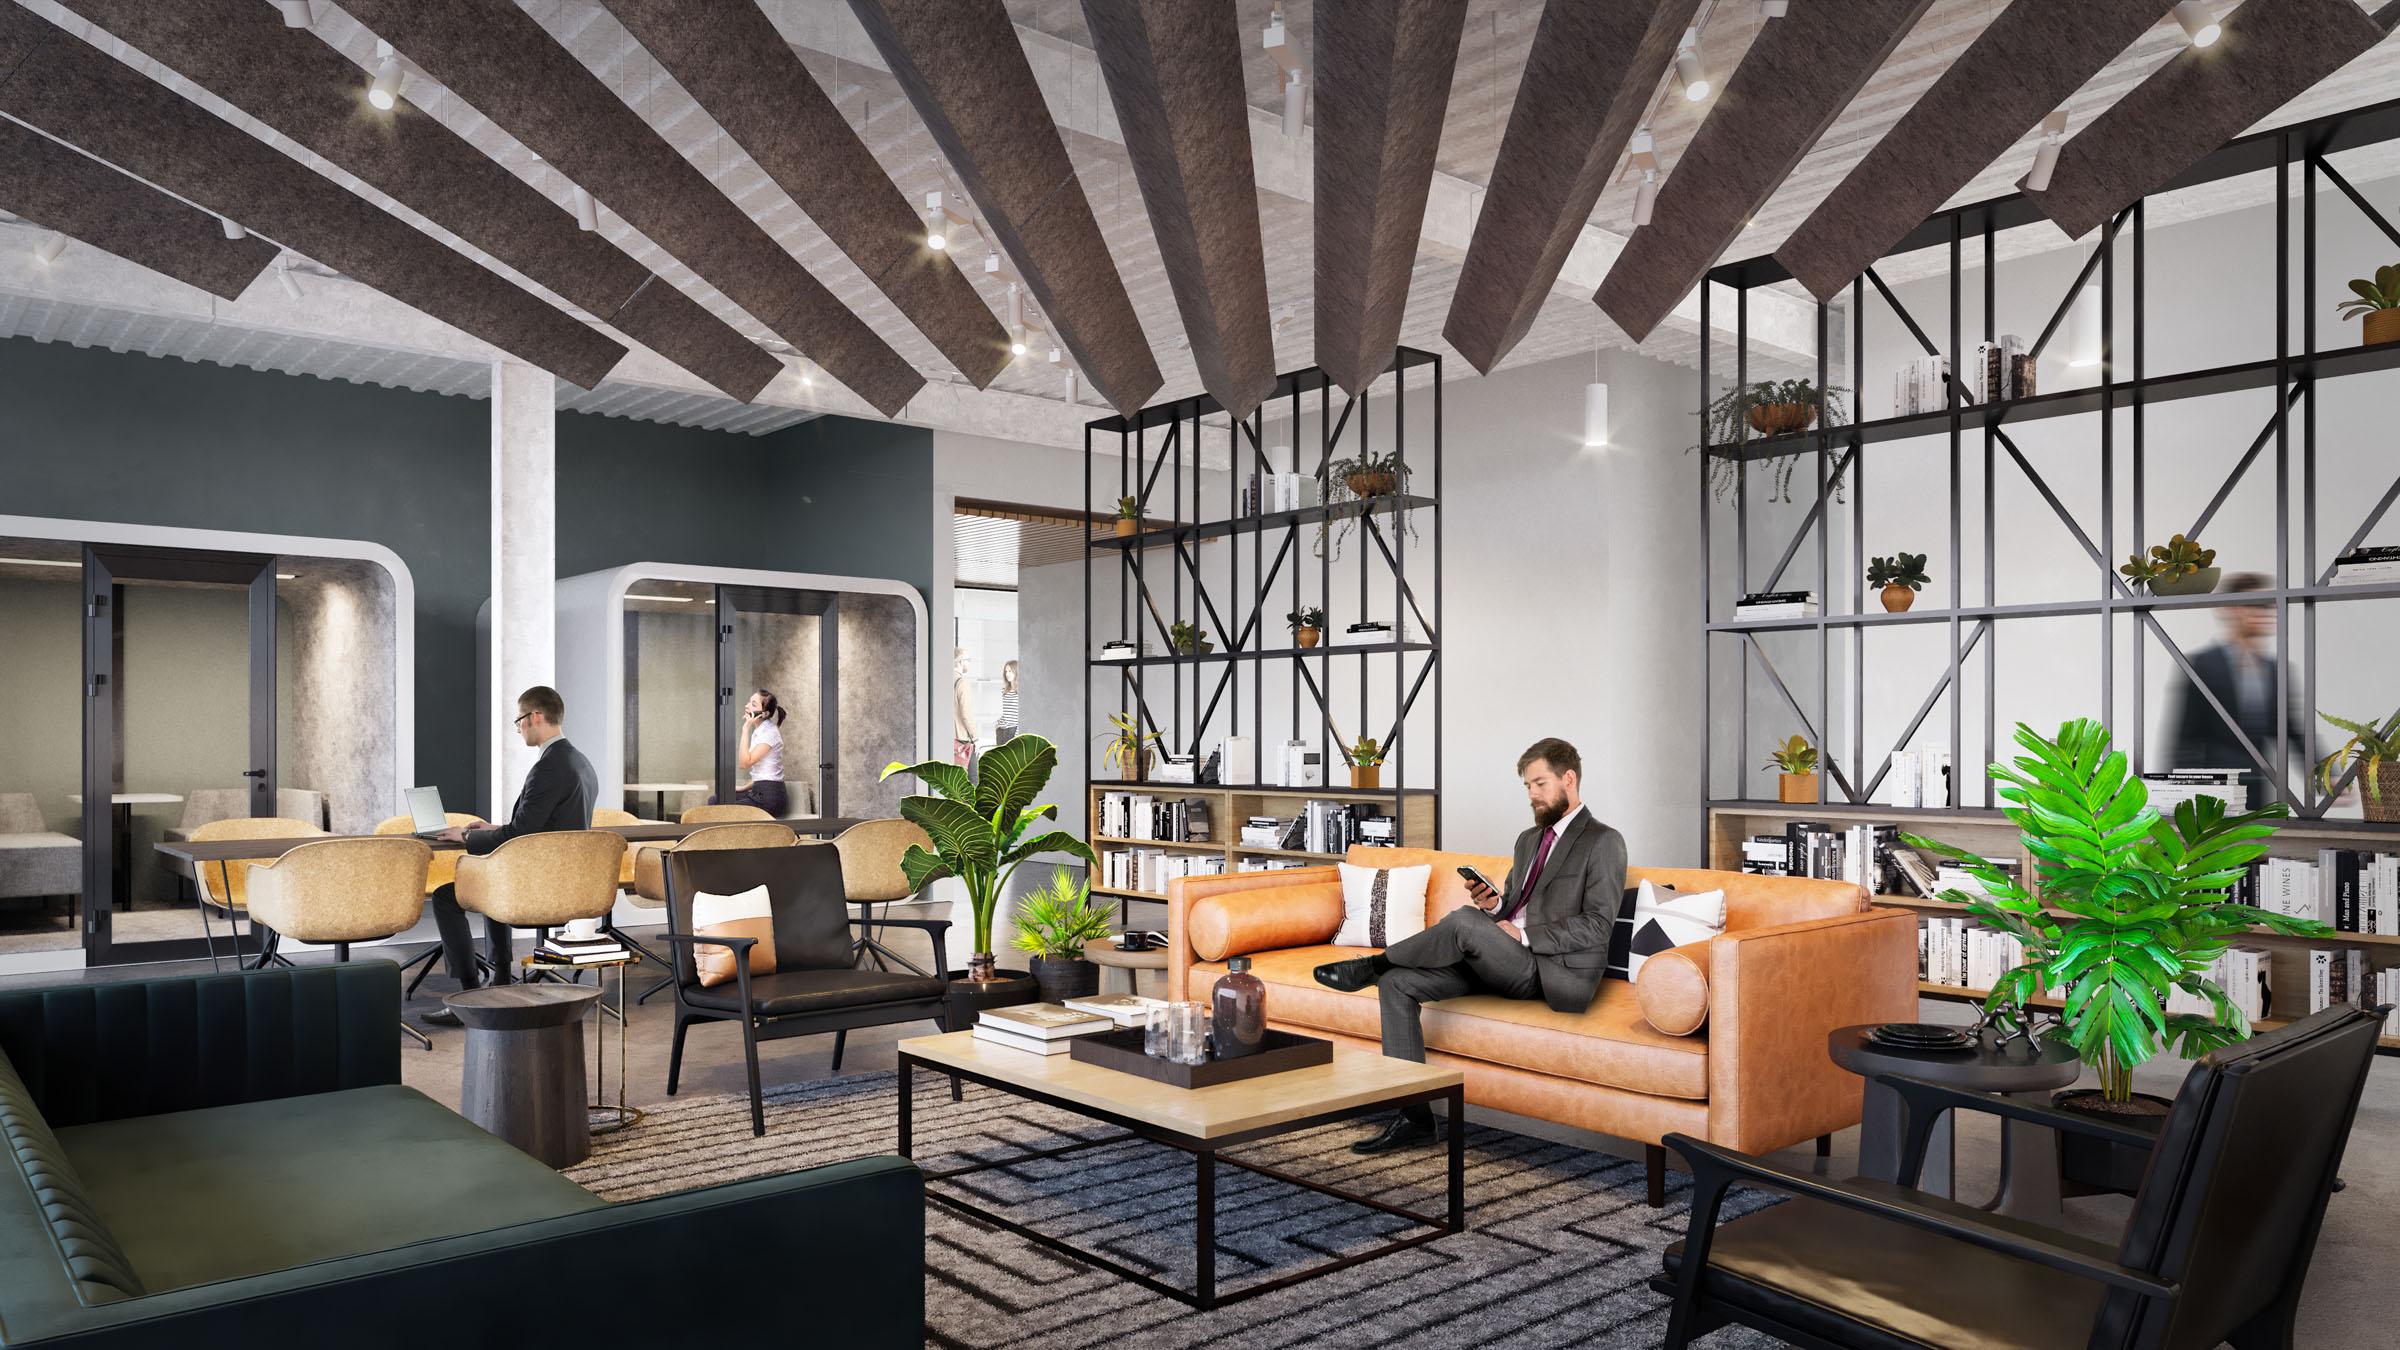 Manhattan Beach Office Space for Rent & Coworking — CTRL